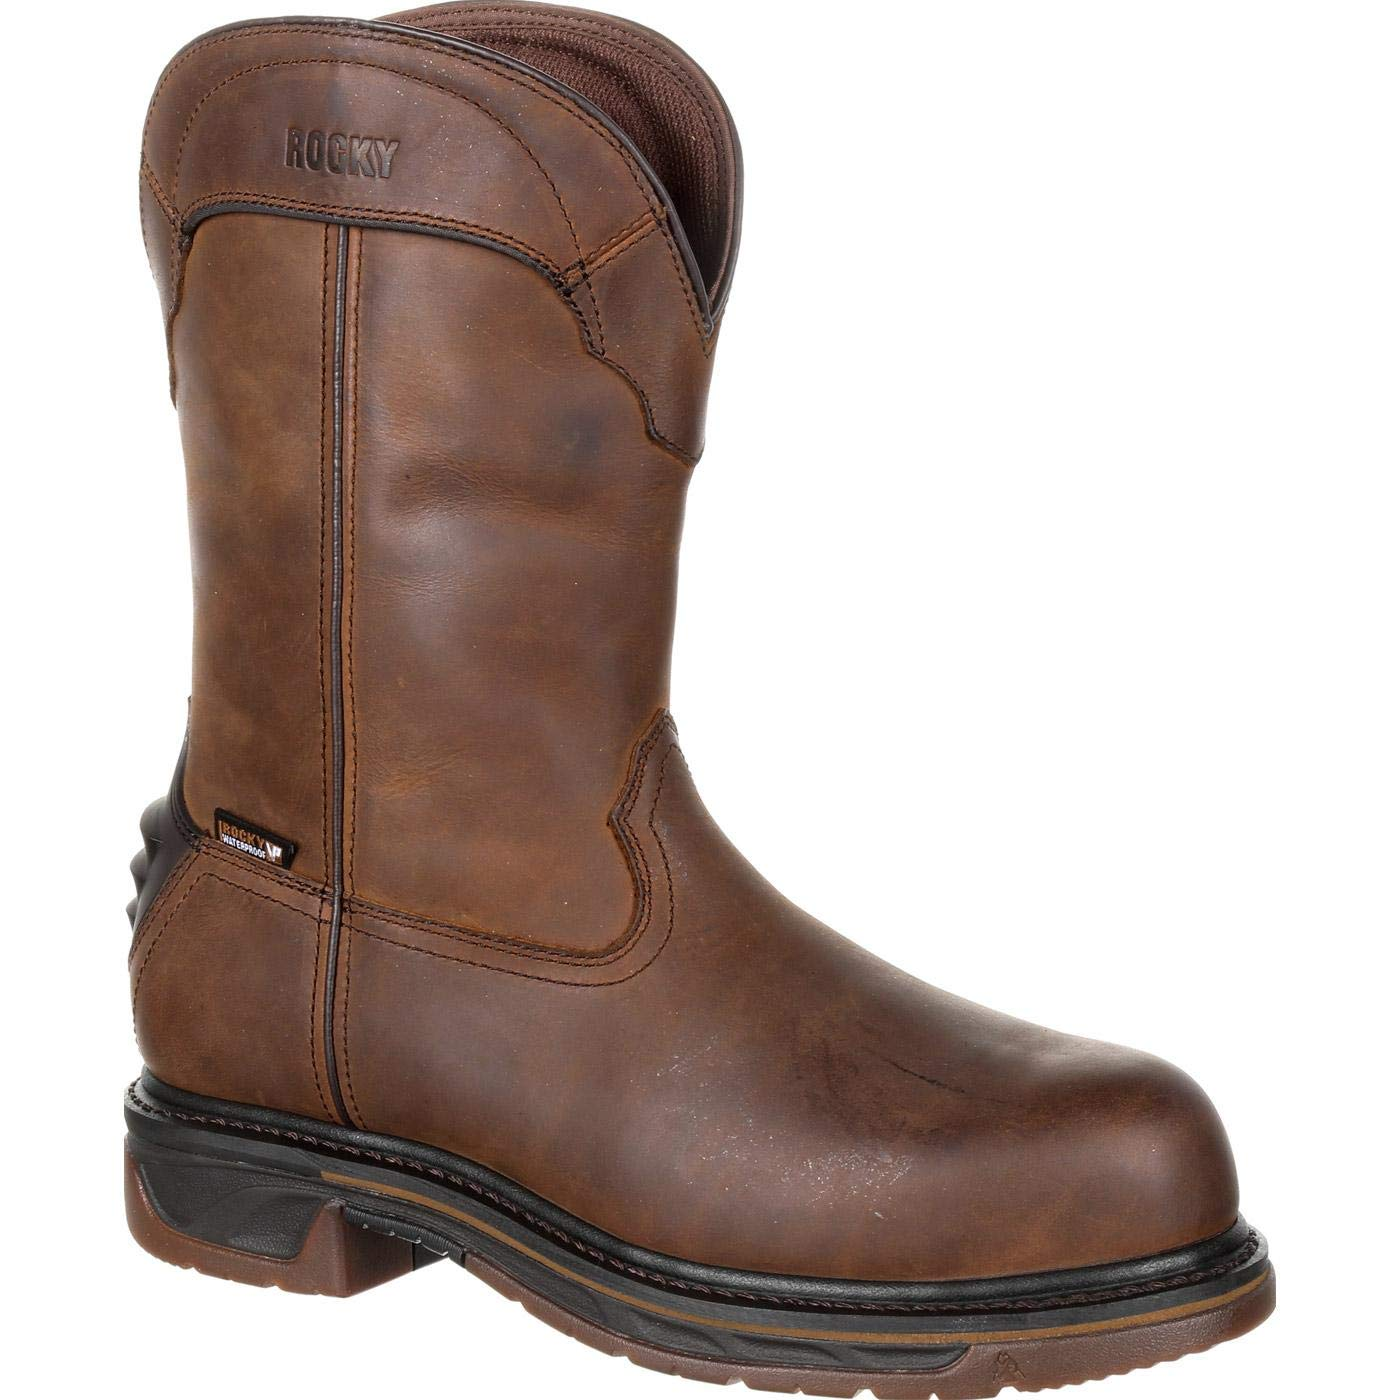 Rocky Men's Iron Skull Waterproof Western Boot Safety Toe Dark Brown 13 EE